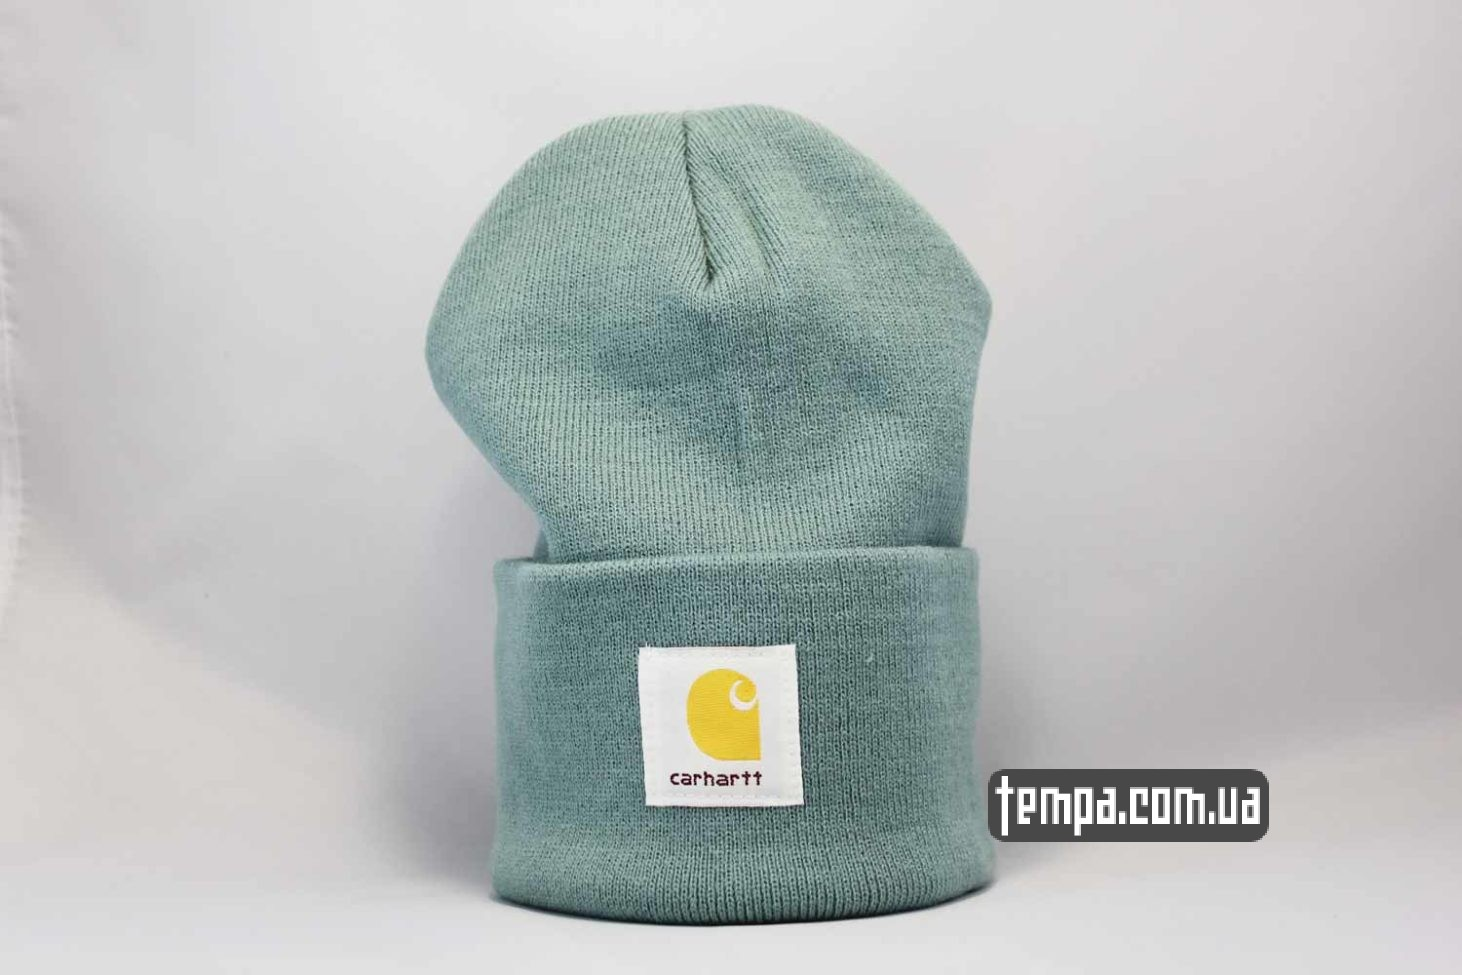 шапка beanie Carhartt зеленая оригинал купить